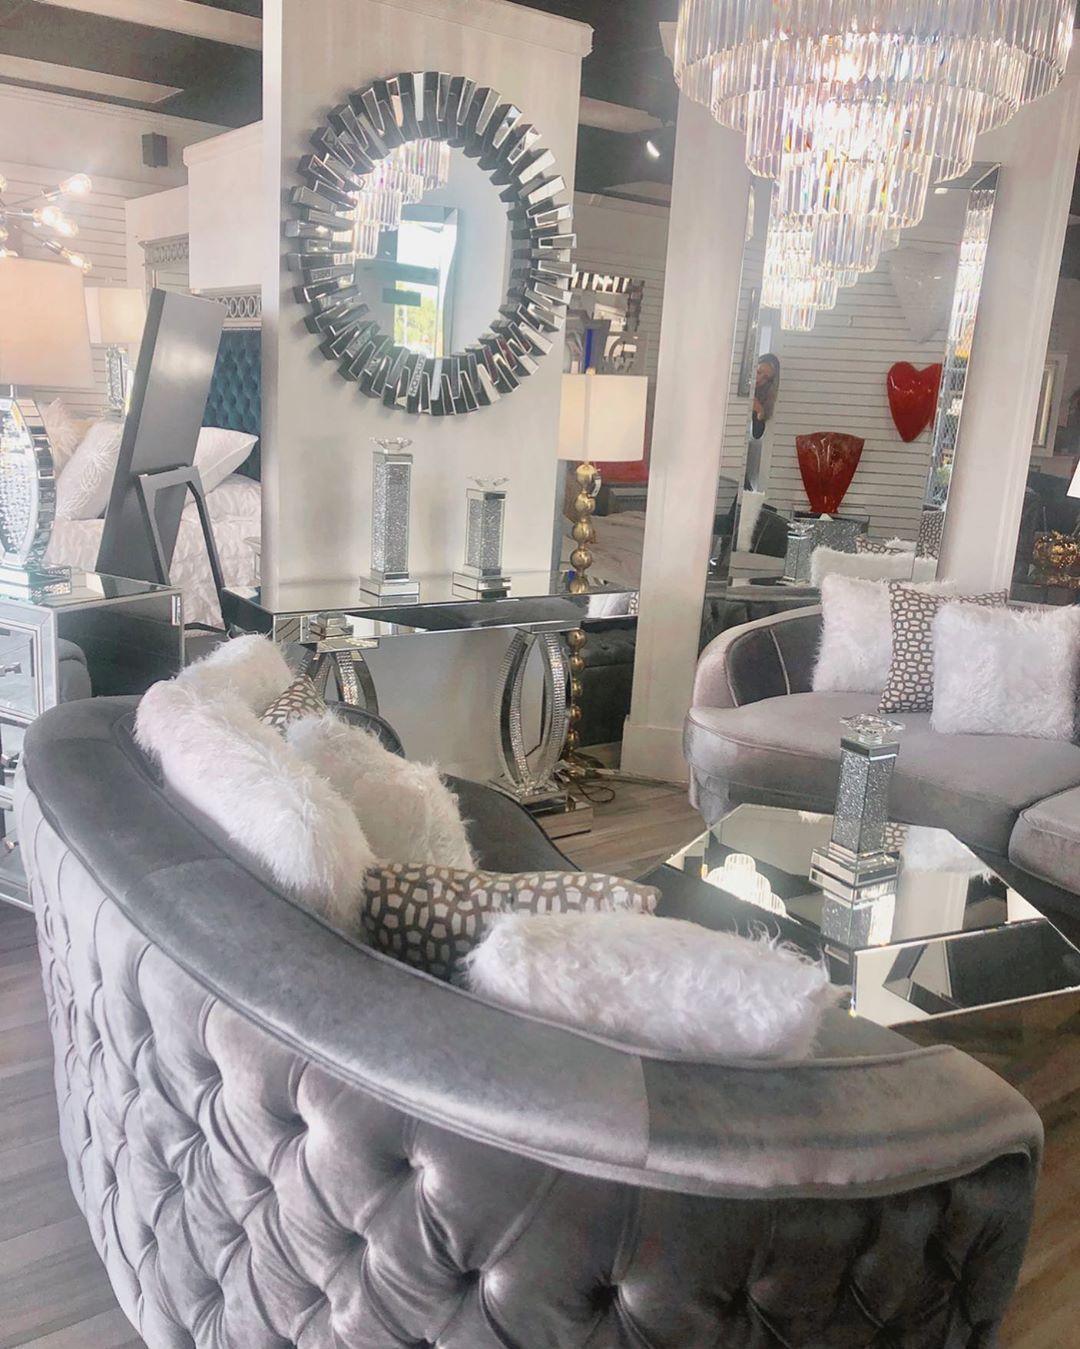 "Coco Furniture Gallery on Instagram: ""New living room displayed @ Birdroad location🖤 - #brickell_living #realestatemiami #love #midtownmiami #interiordesign #southflorida…"""